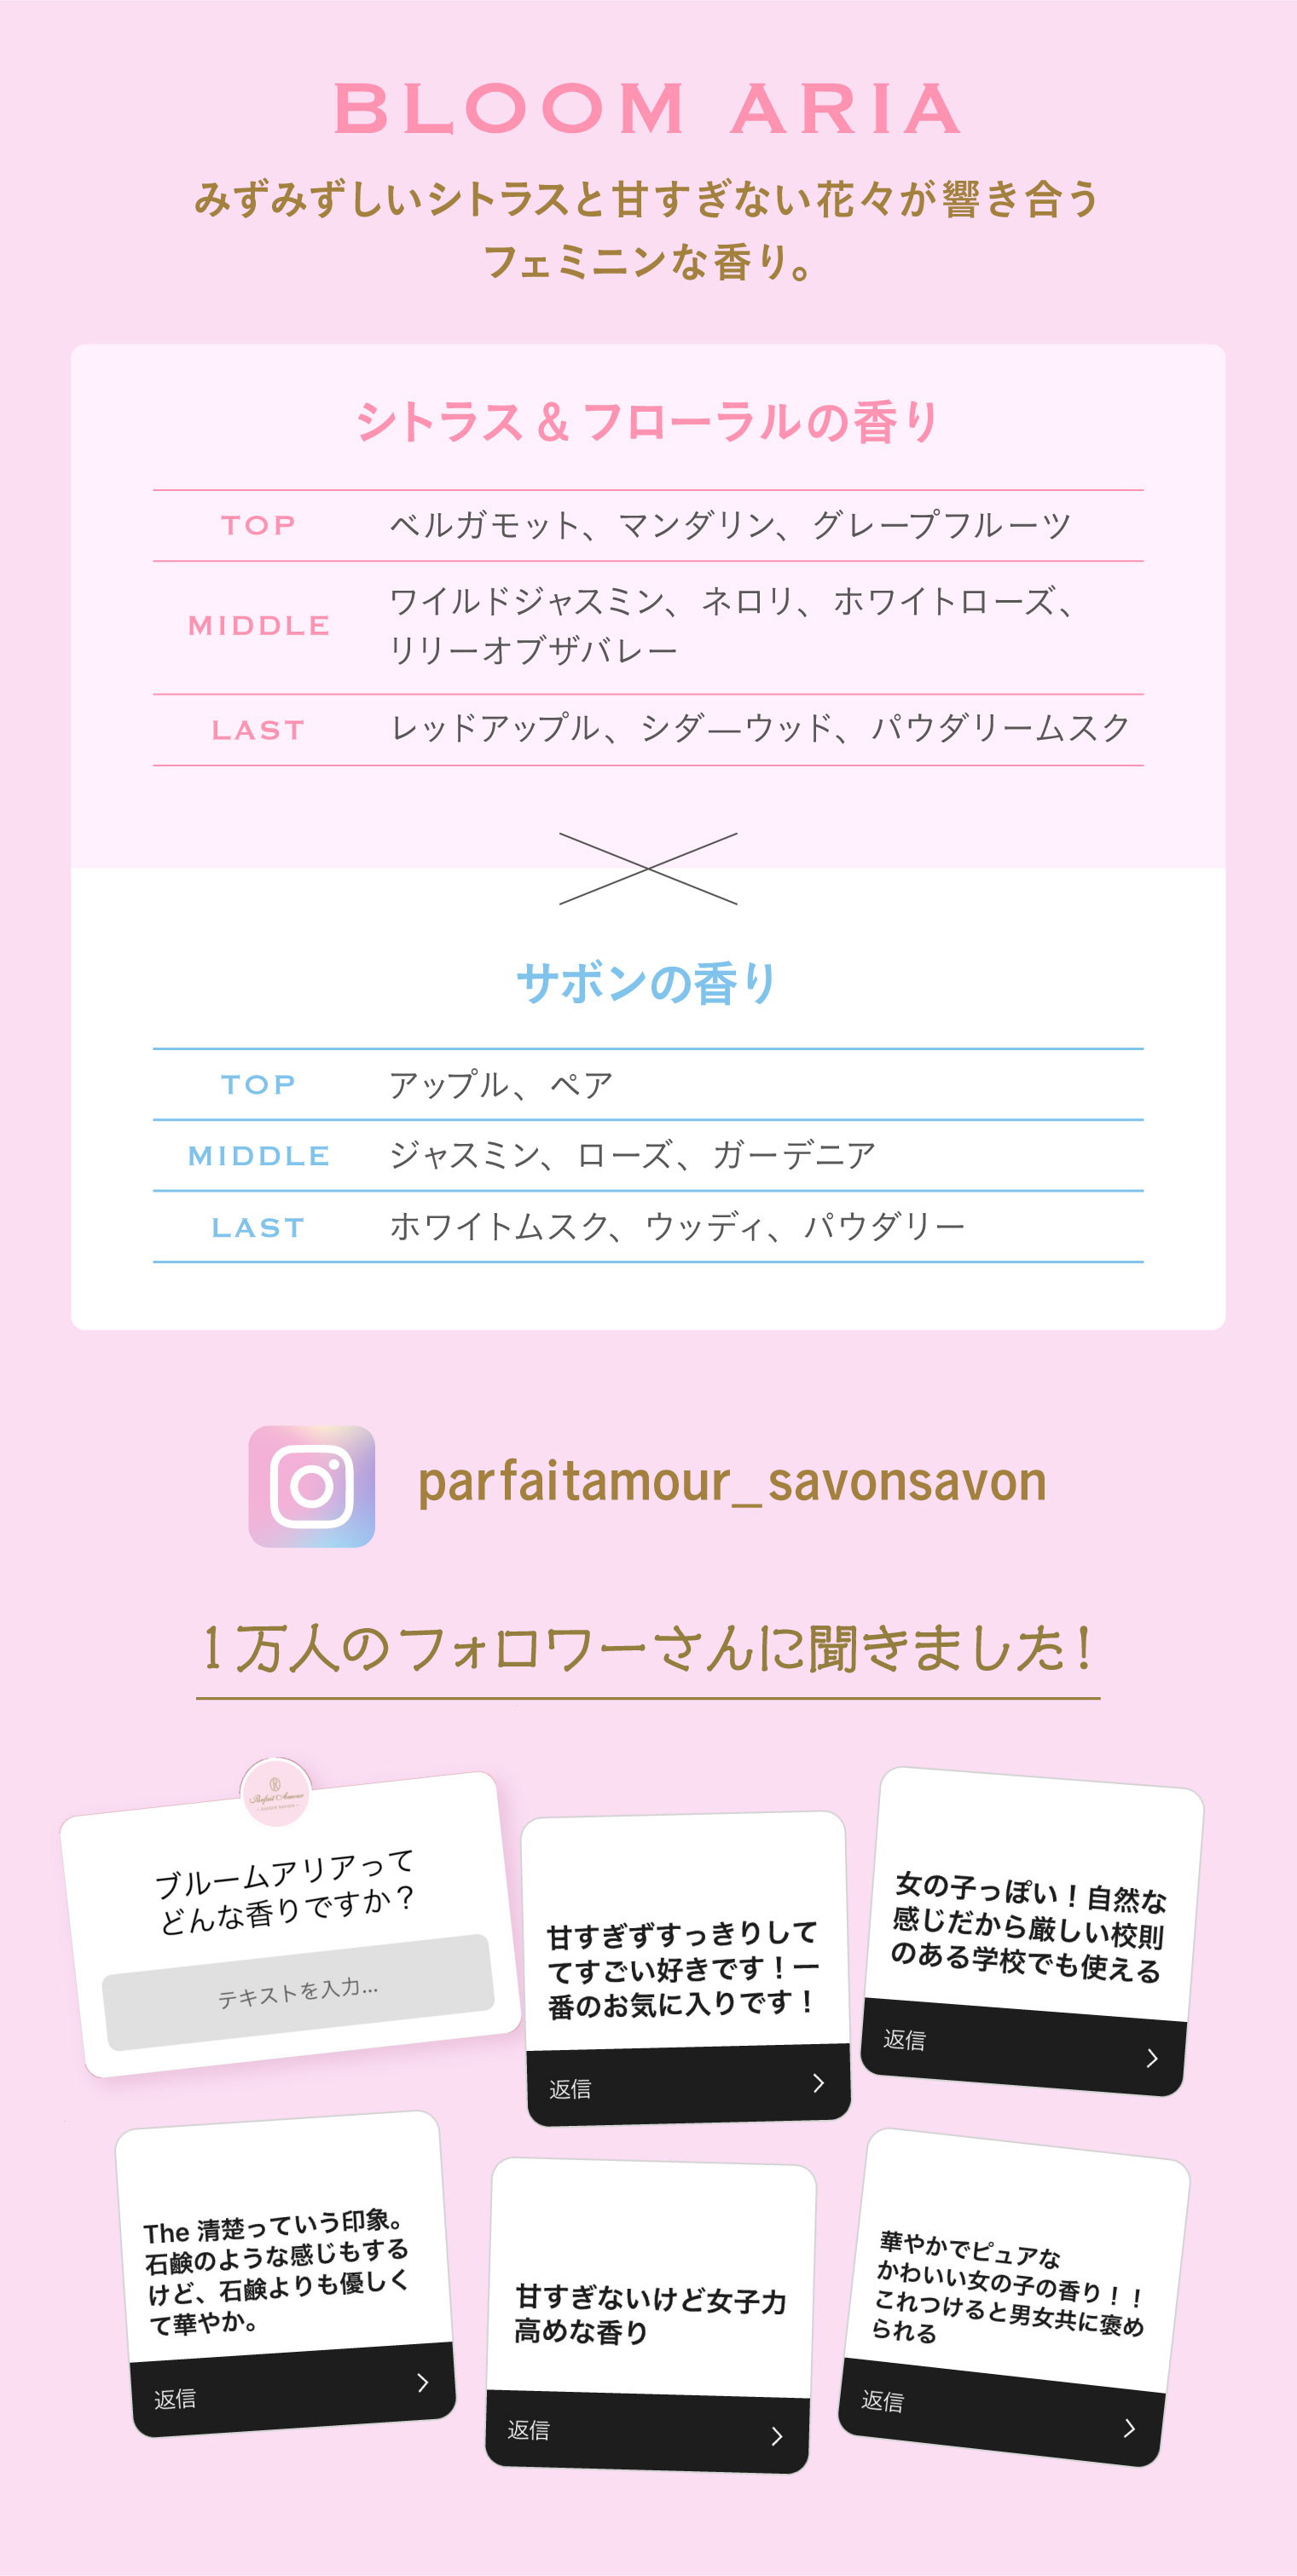 SAVON_roll_on_shousai_1_BA.jpg